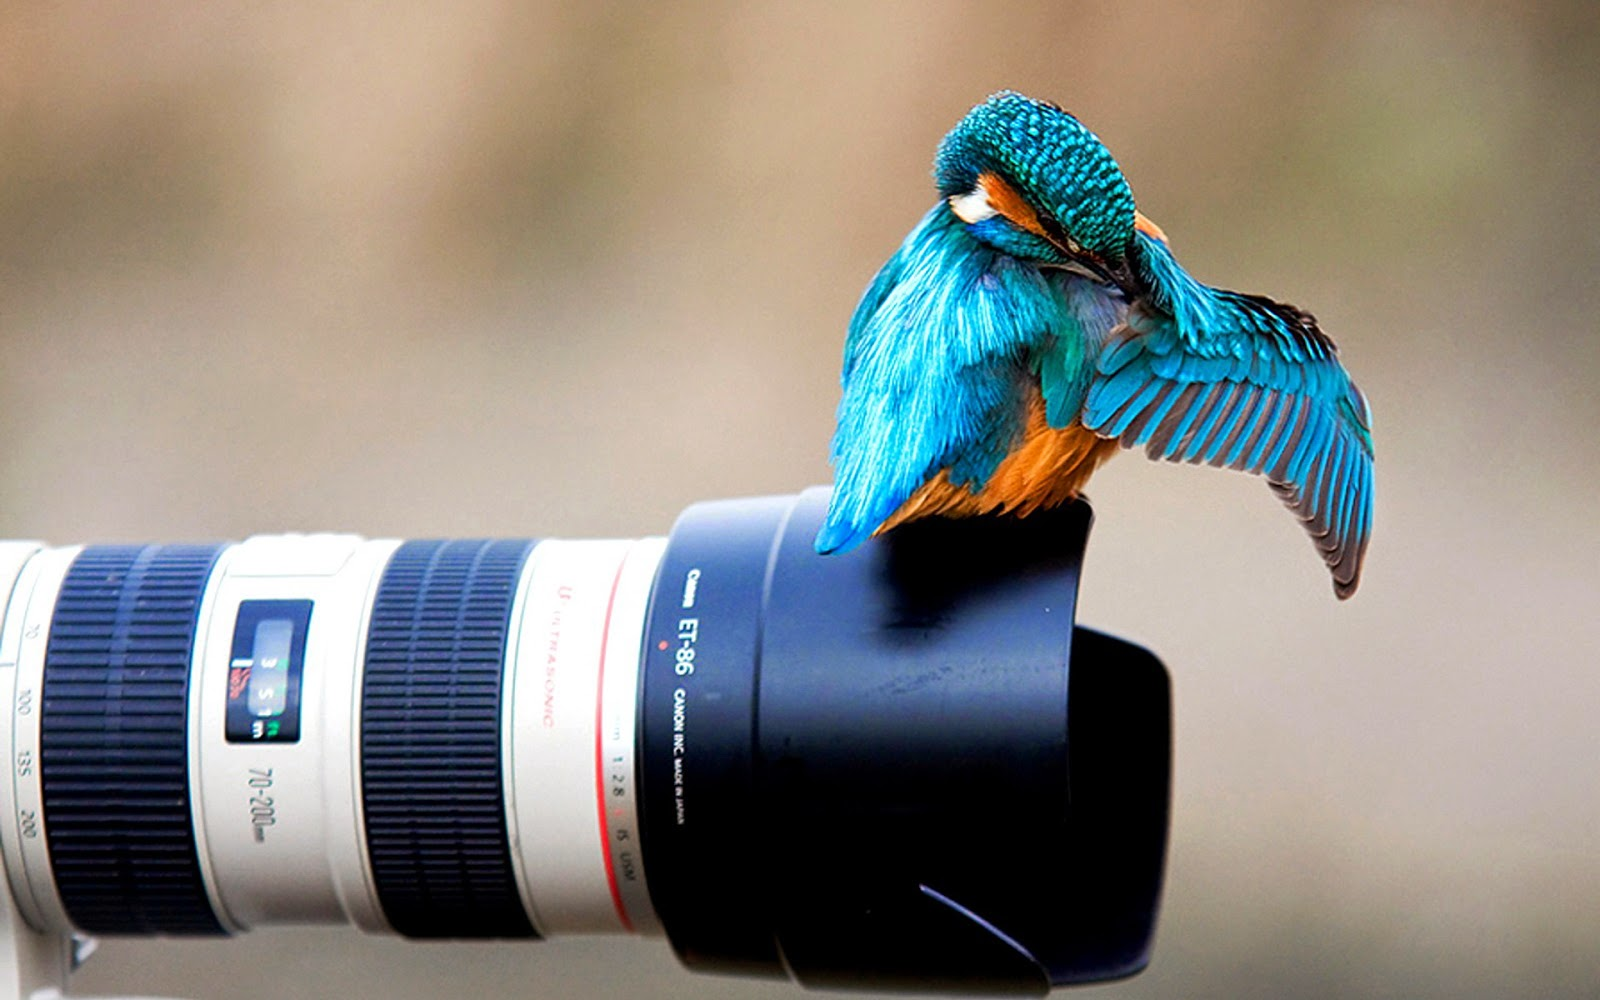 Creative Photography HD Wallpapers | Whatsapp Status ...